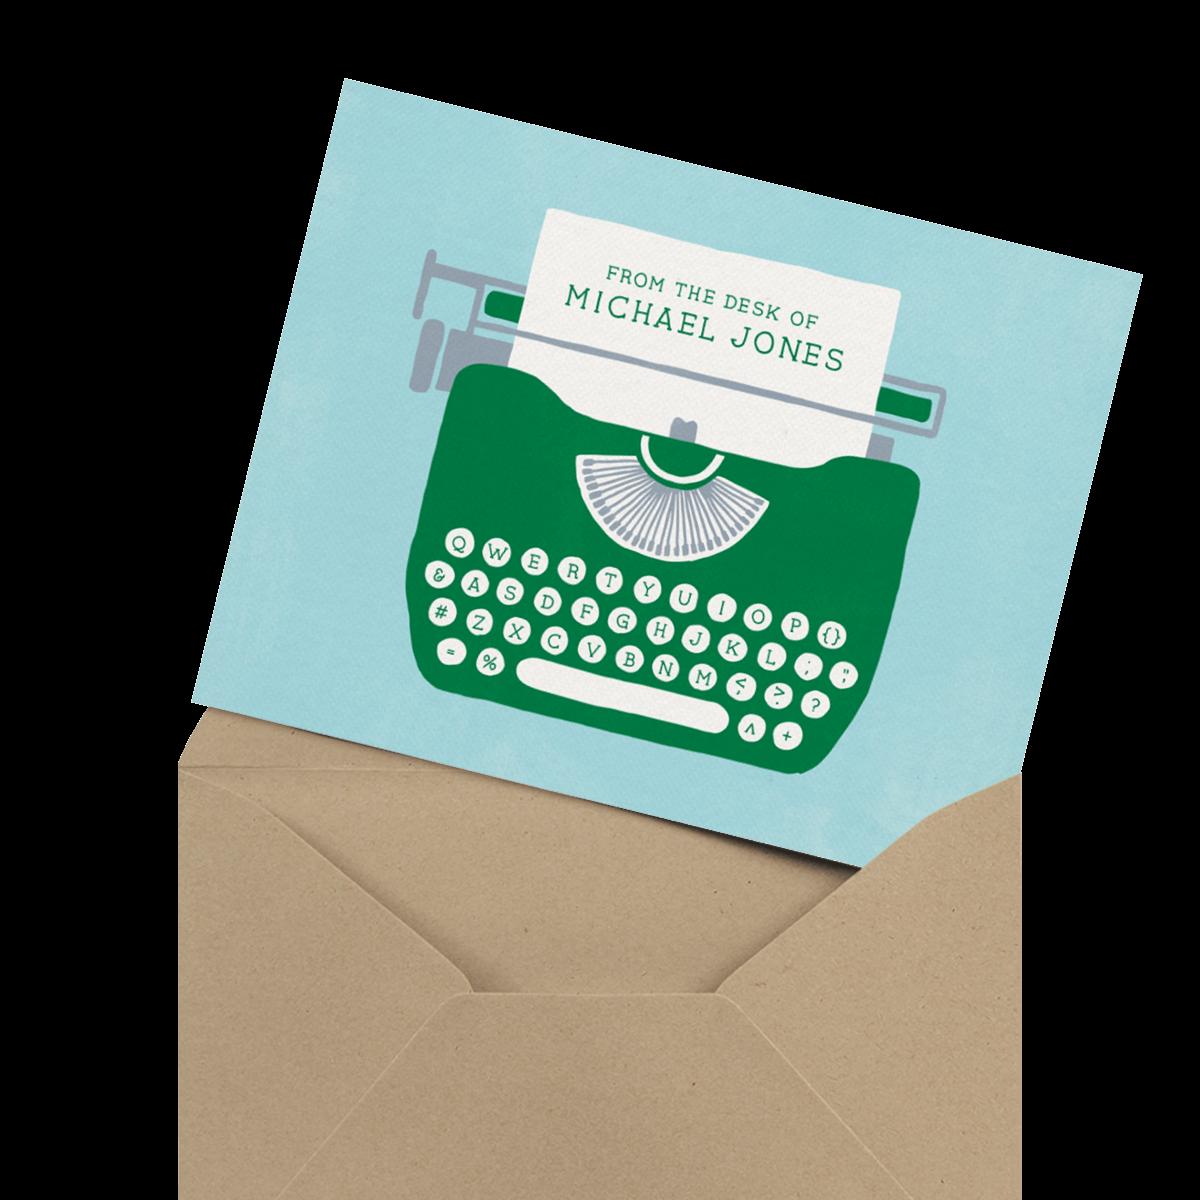 typewriter personalized stationery card